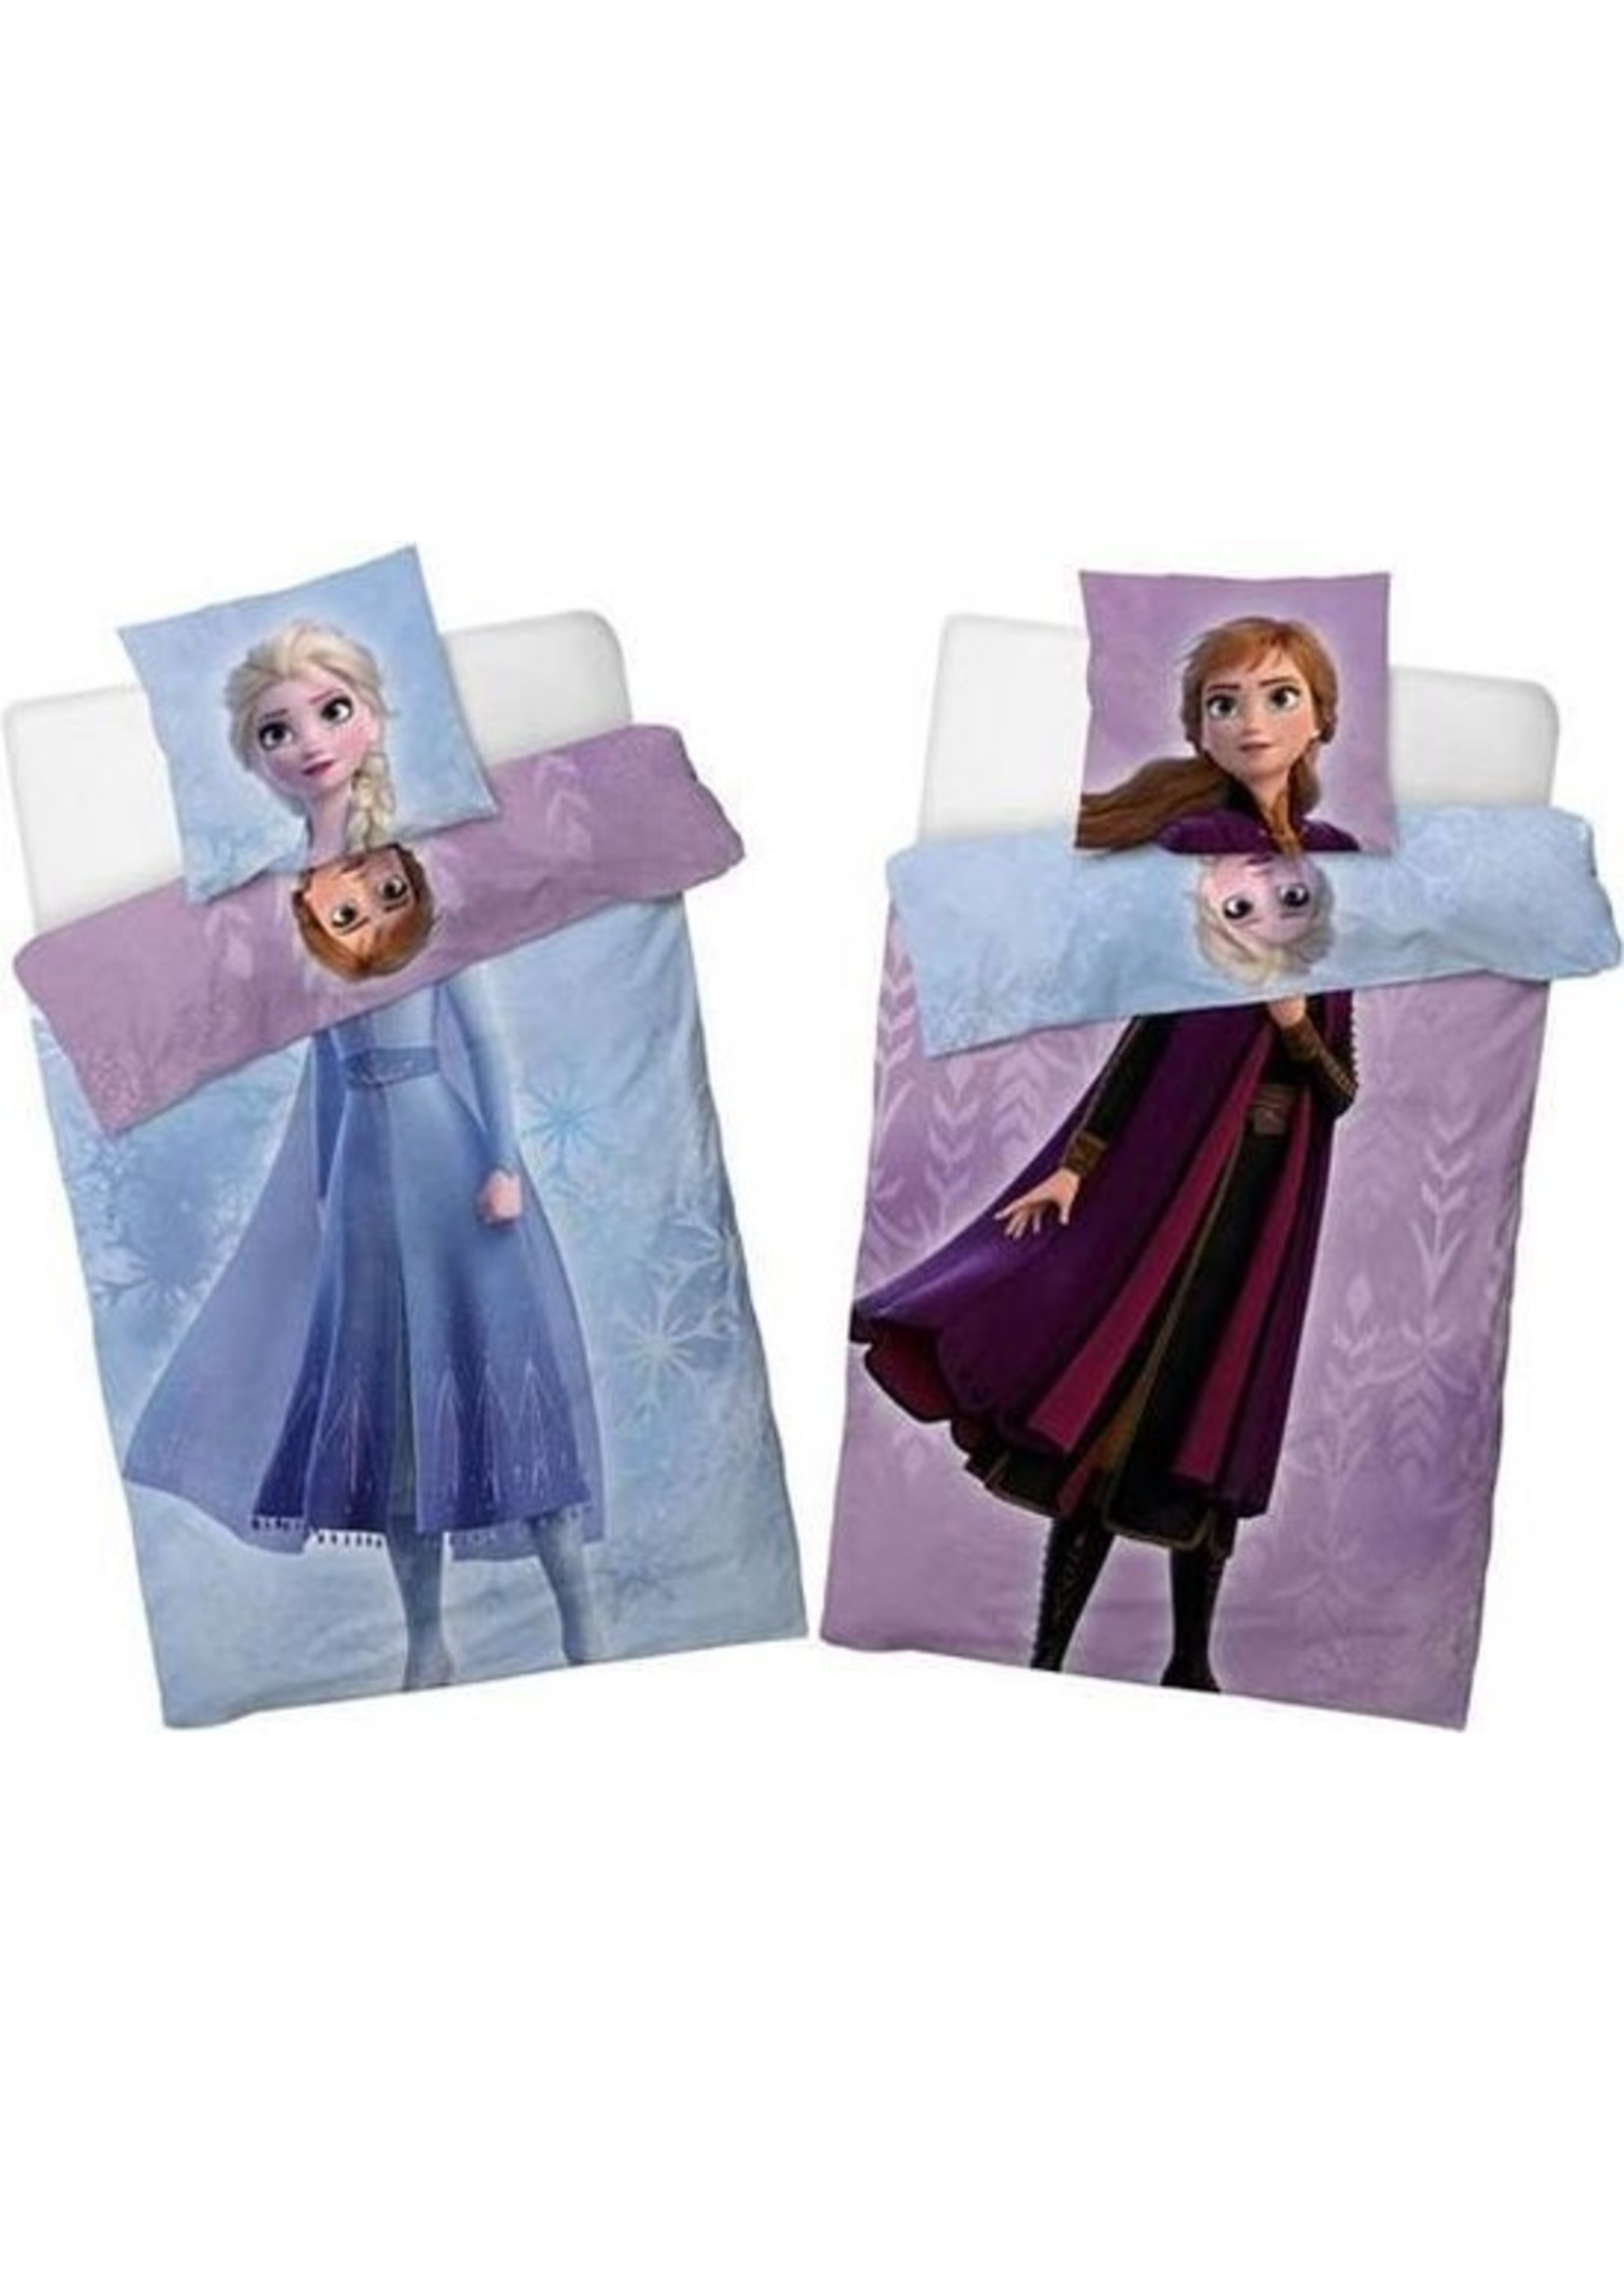 Frozen Dekbedovertrek Double Face Anna & Elsa 140x200cm